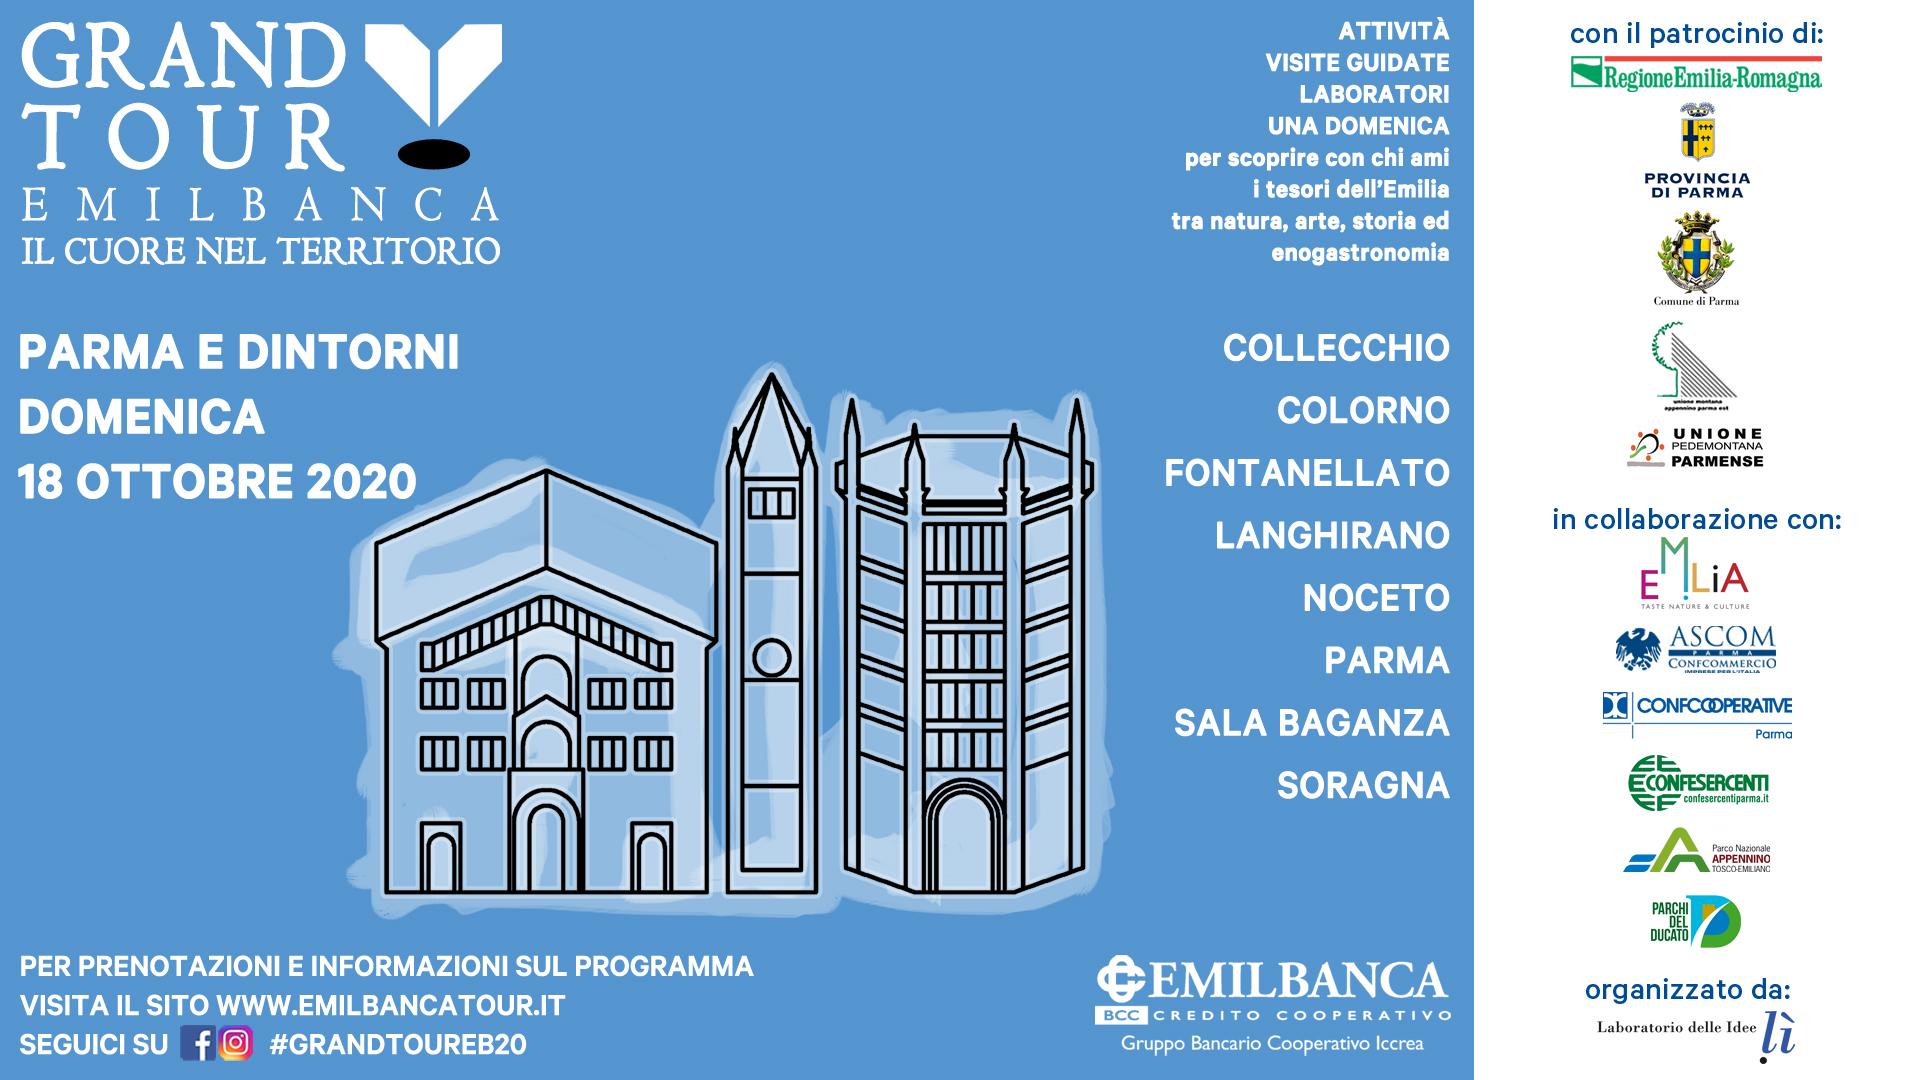 Grand Tour Emil Banca - Parma e dintorni 1920 x 1080